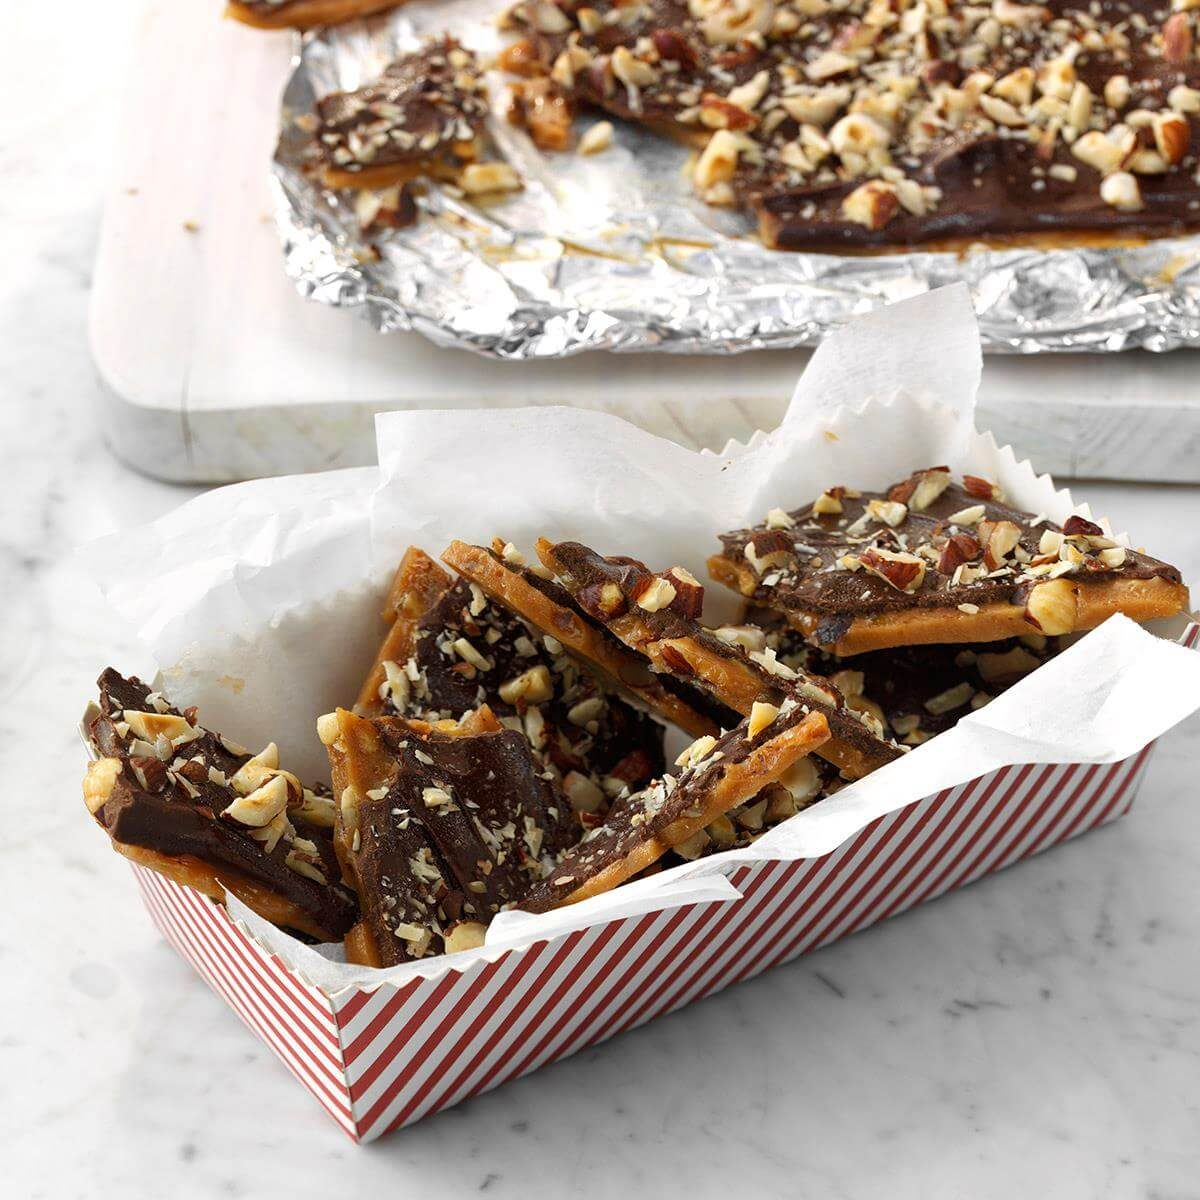 Hazelnut Kitchen: Contest-Winning Hazelnut Toffee Recipe